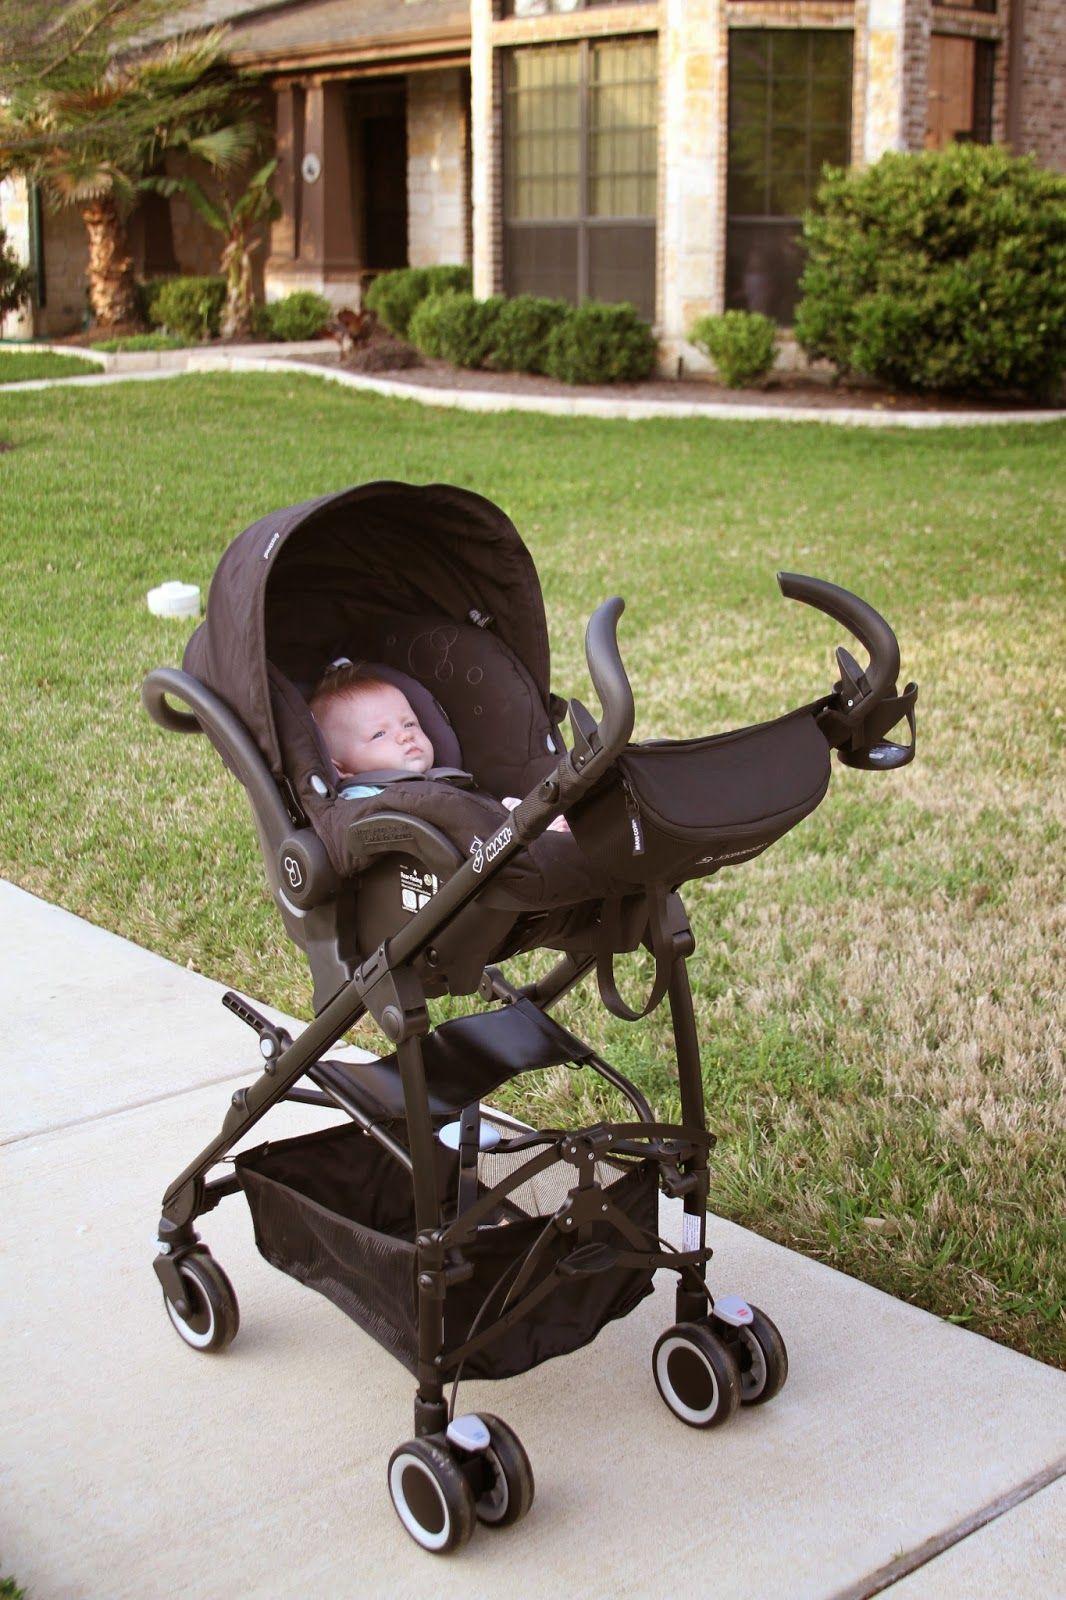 maxicosi mico nxt infant car seat  maxitaxi infant car seat  - maxicosi mico nxt infant car seat  maxitaxi infant car seat carrier